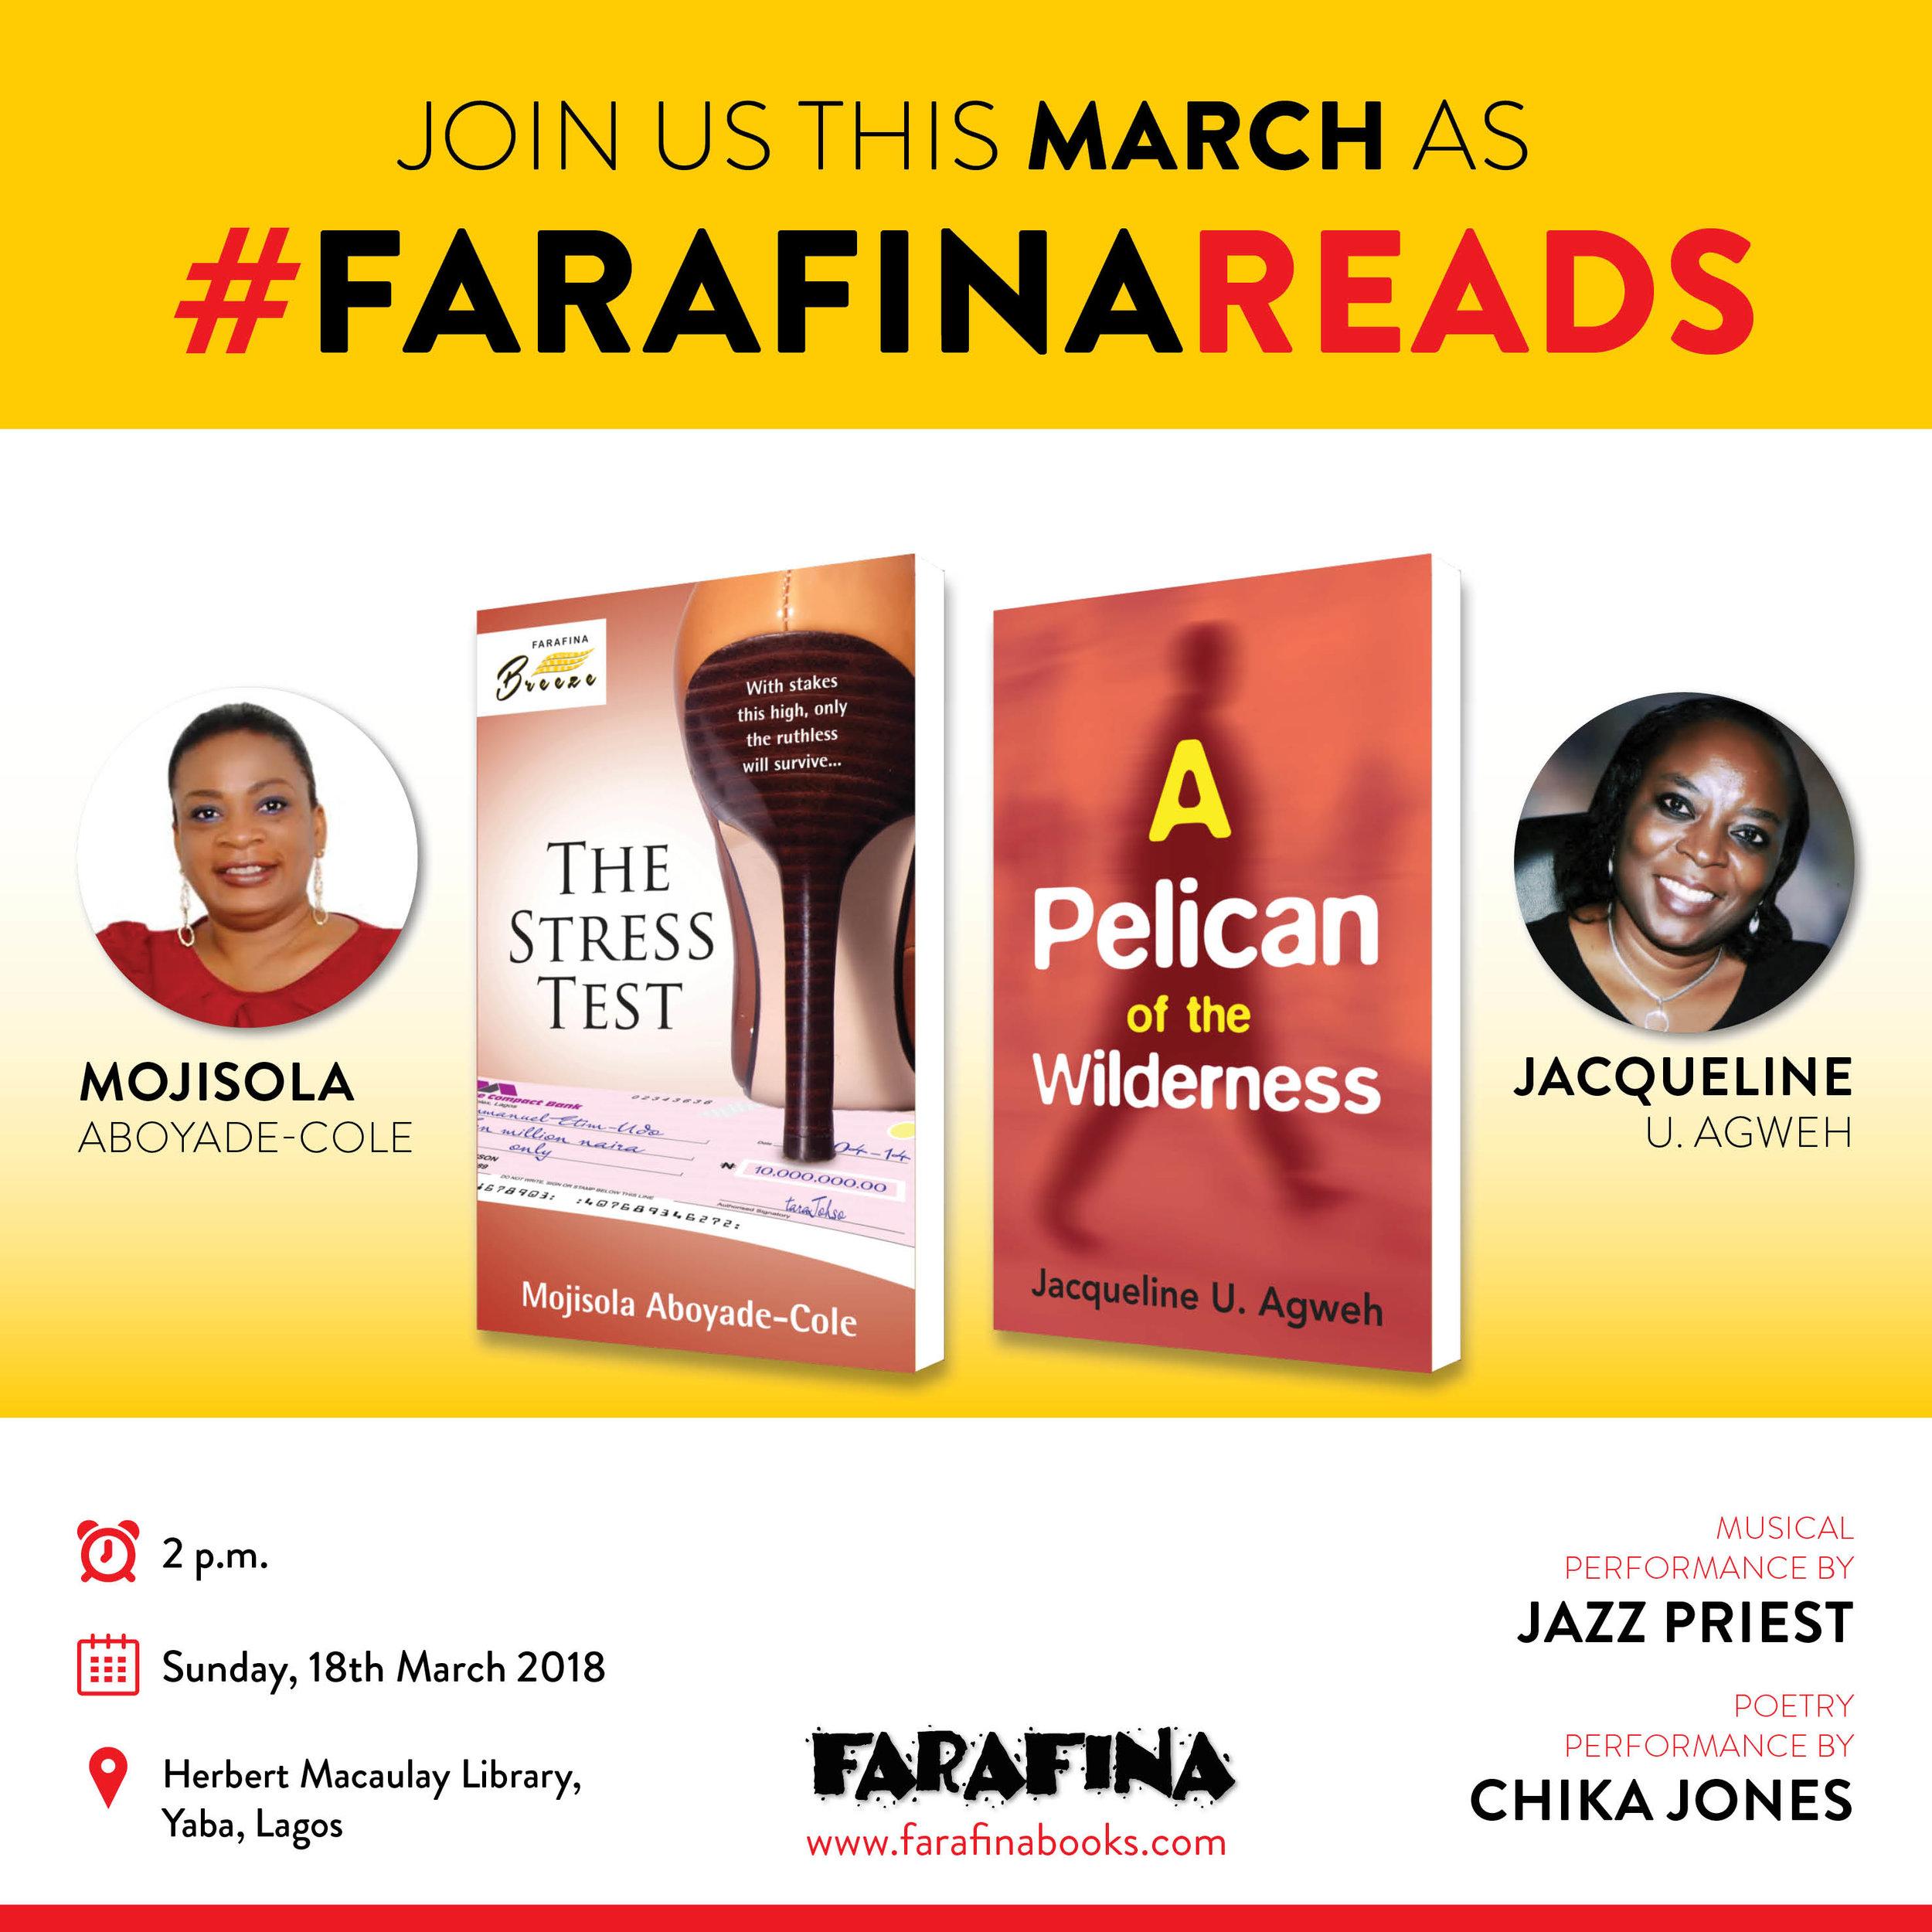 Farafina Reads_Jacqueline Agweh and Aboyade-Cole.jpg